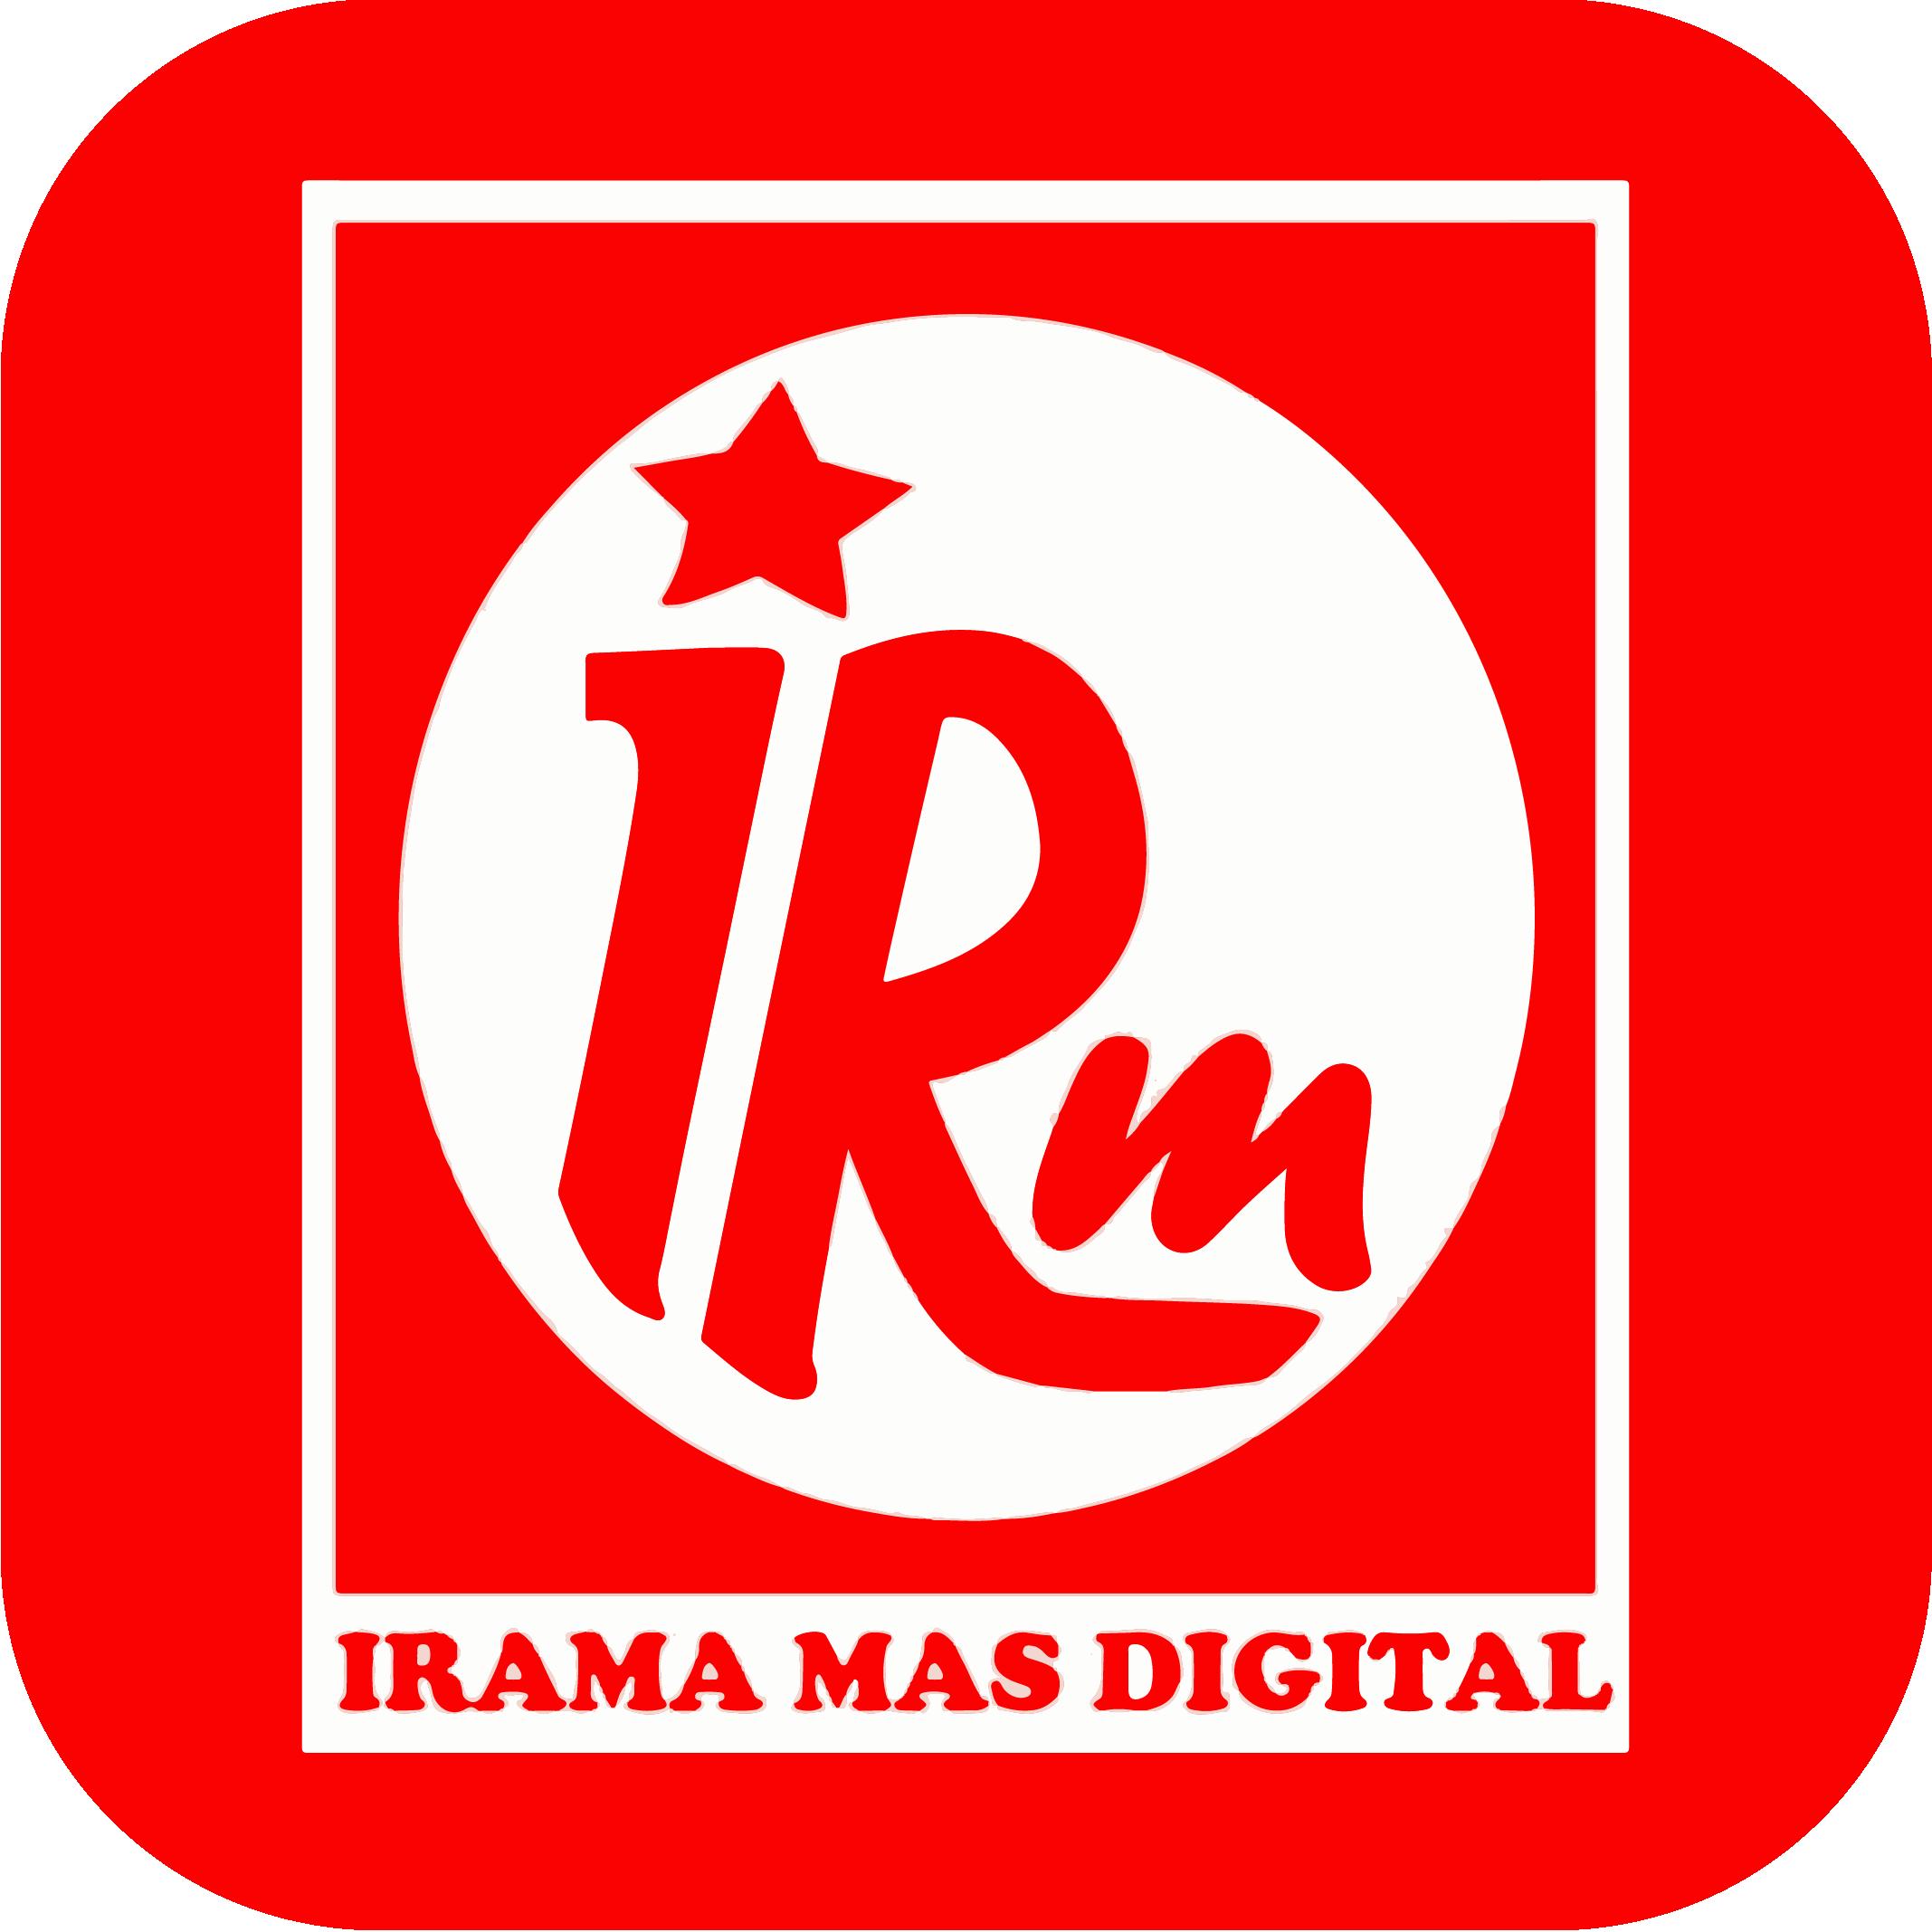 IRAMA MAS DIGITAL